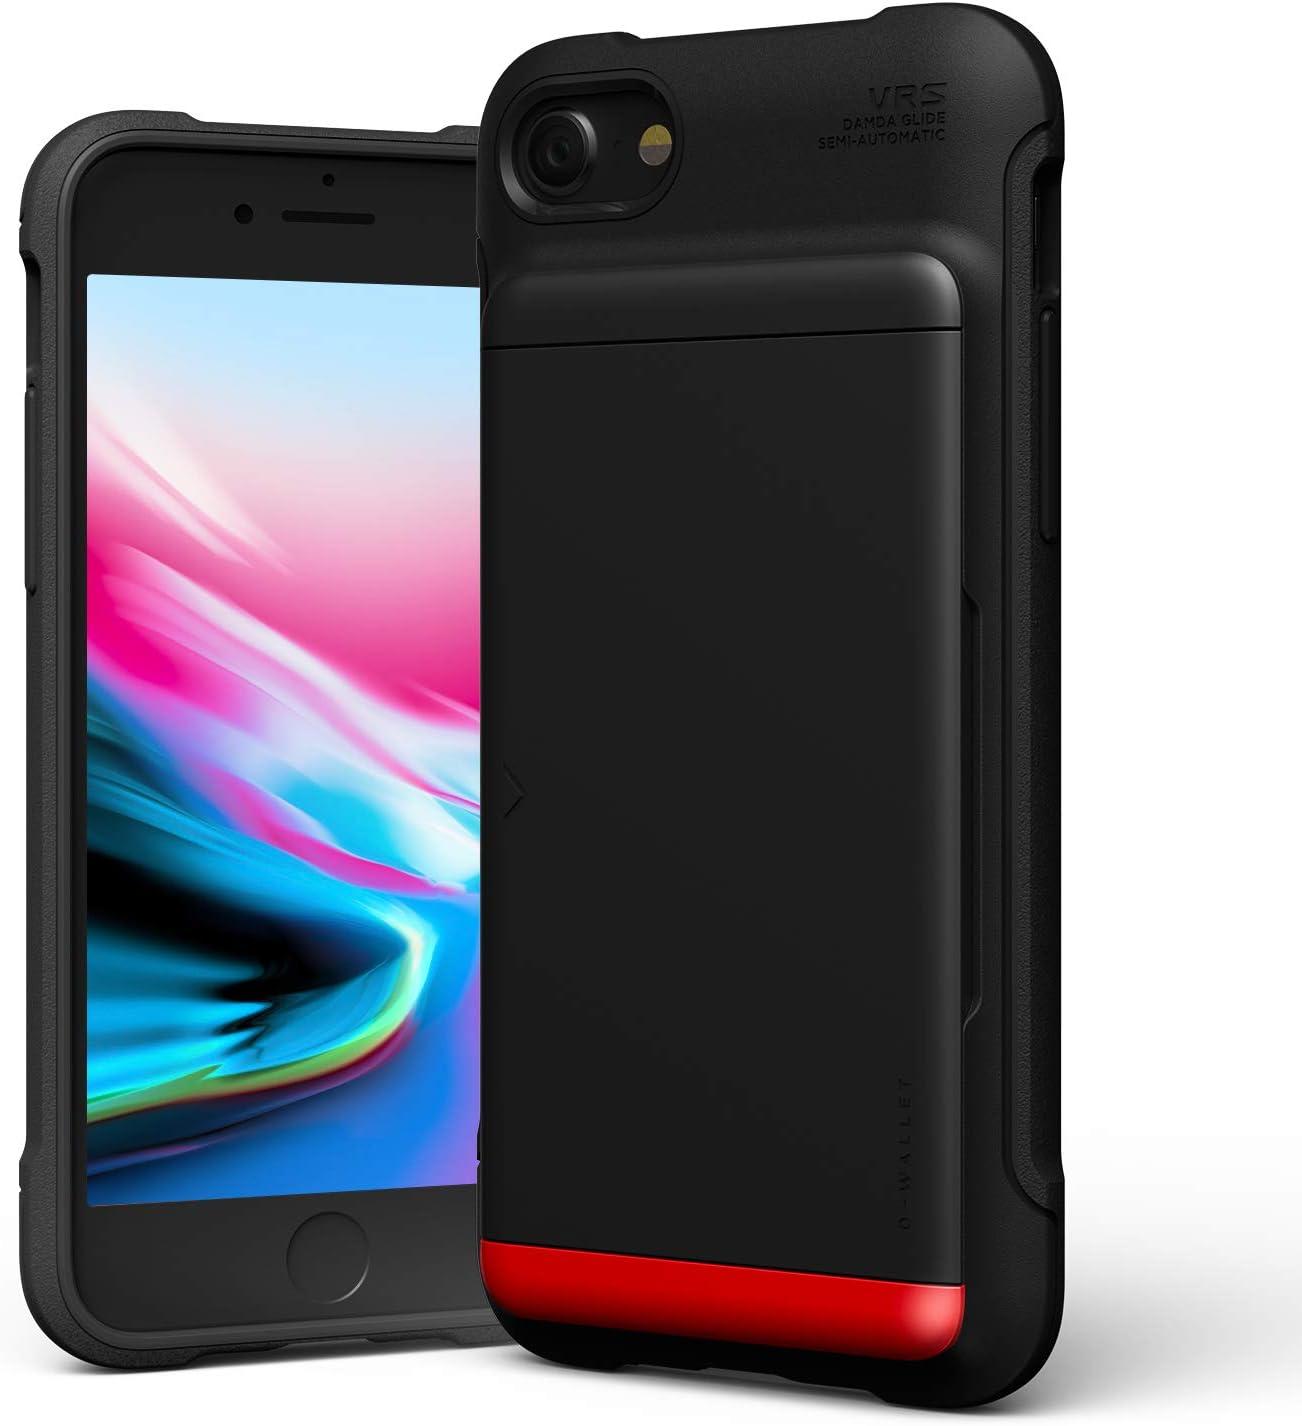 iPhone SE (2020) / 8 Case, VRS Design Damda Glide Shield Heavy Duty Protective Vault Grip TPU Semi-Auto Slide Slim Shockproof Credit Card Slot Wallet Case Compatible with Apple iPhone SE (2020) / 8/7